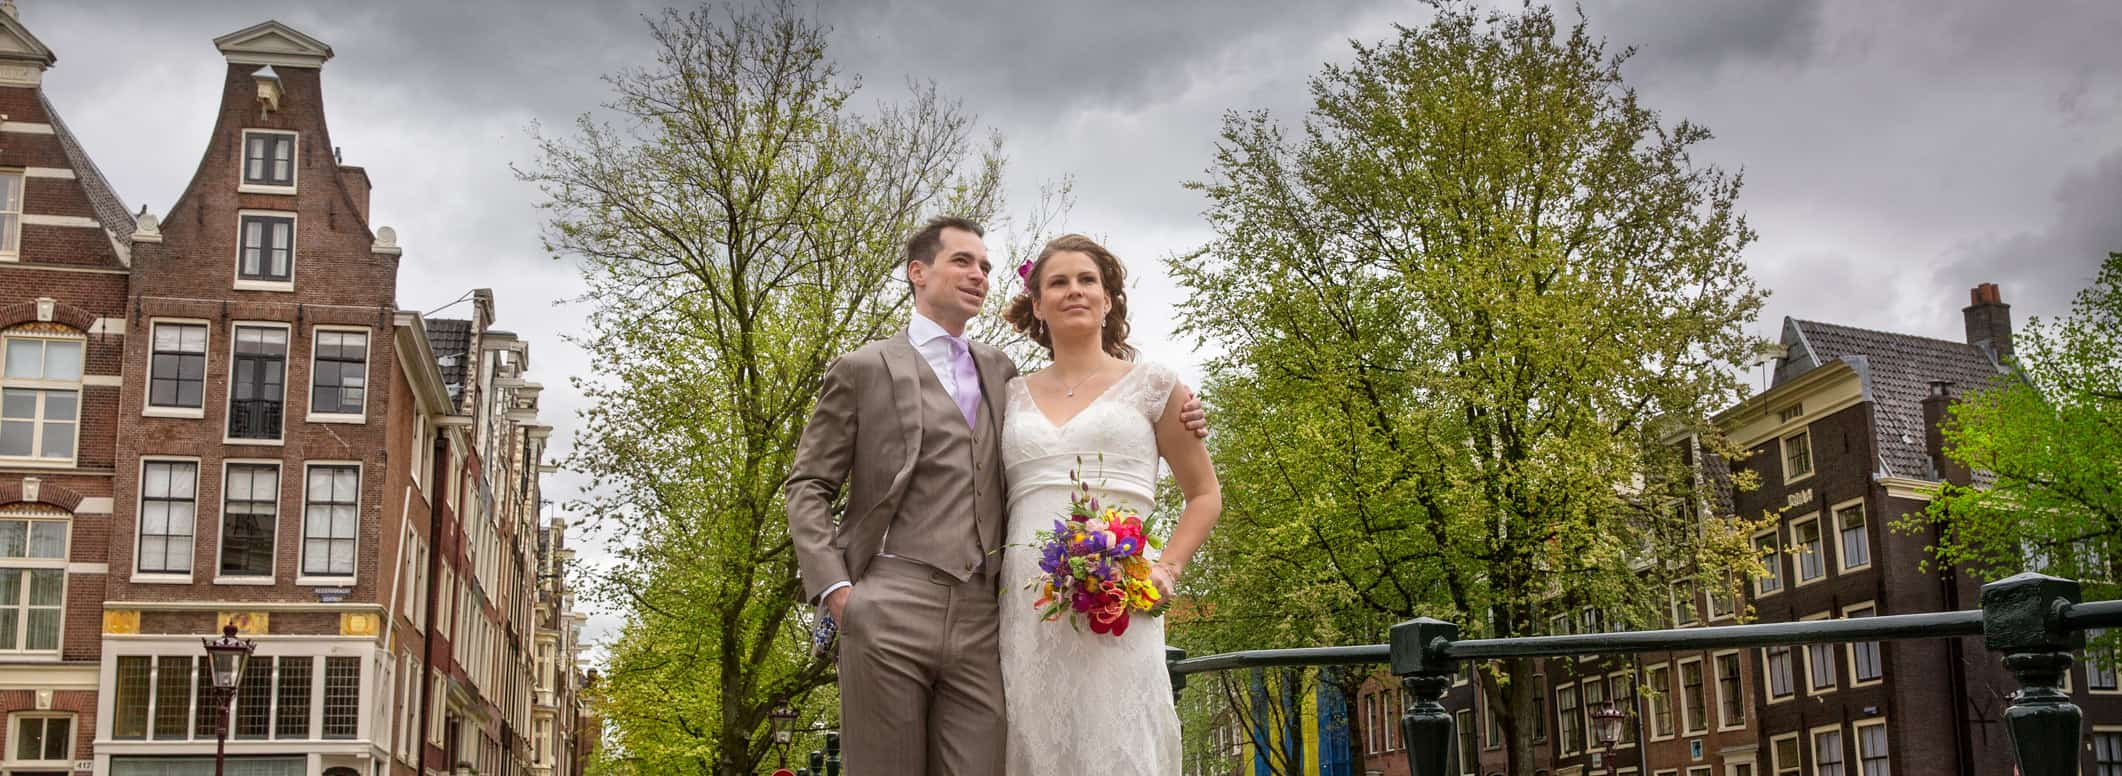 bruidsfotografie Amsterdam grachten